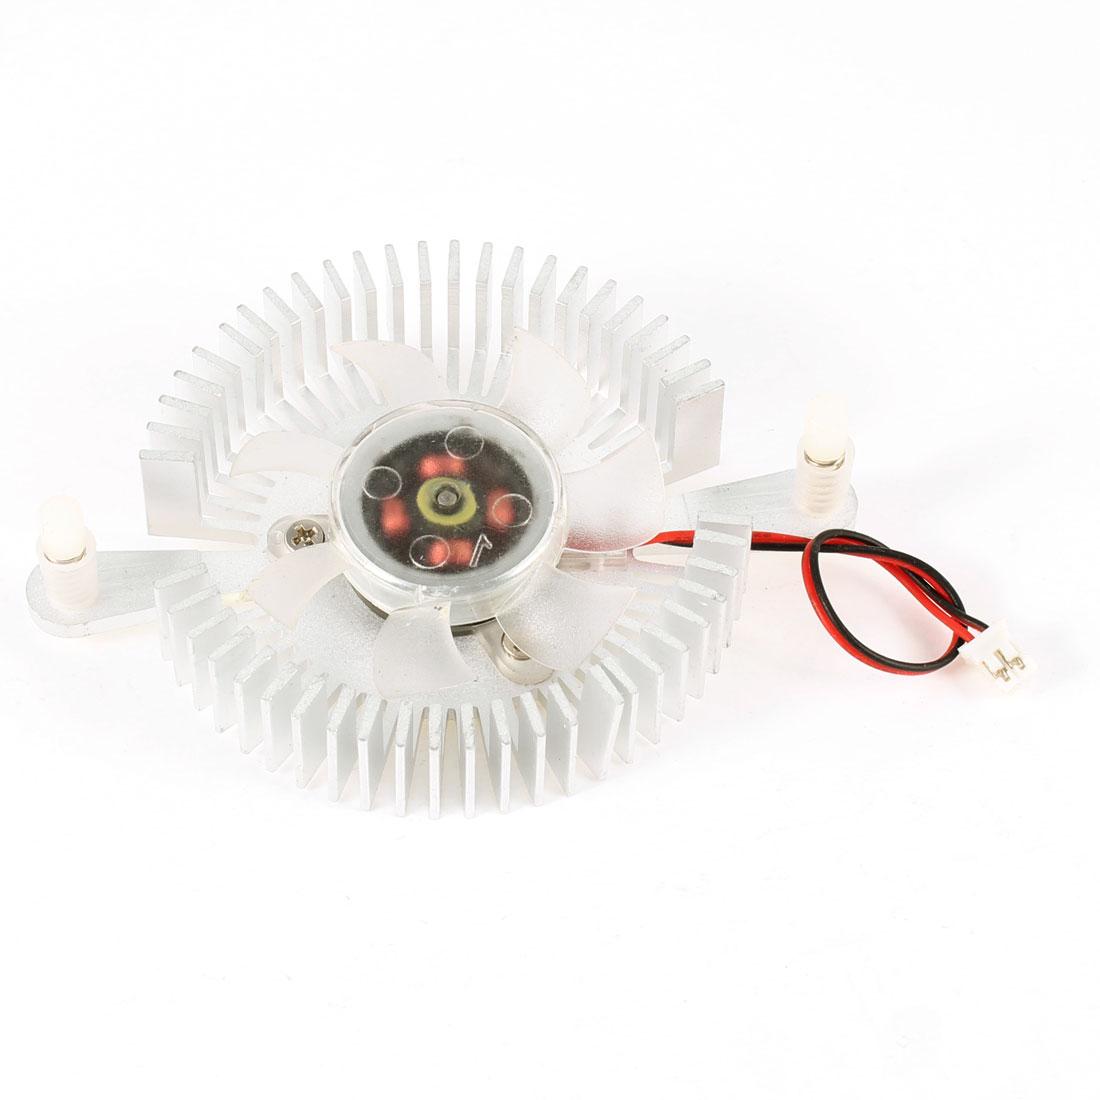 PC Silver Tone Aluminum VGA Video Card Cooling Fan Round Heatsink 64mm